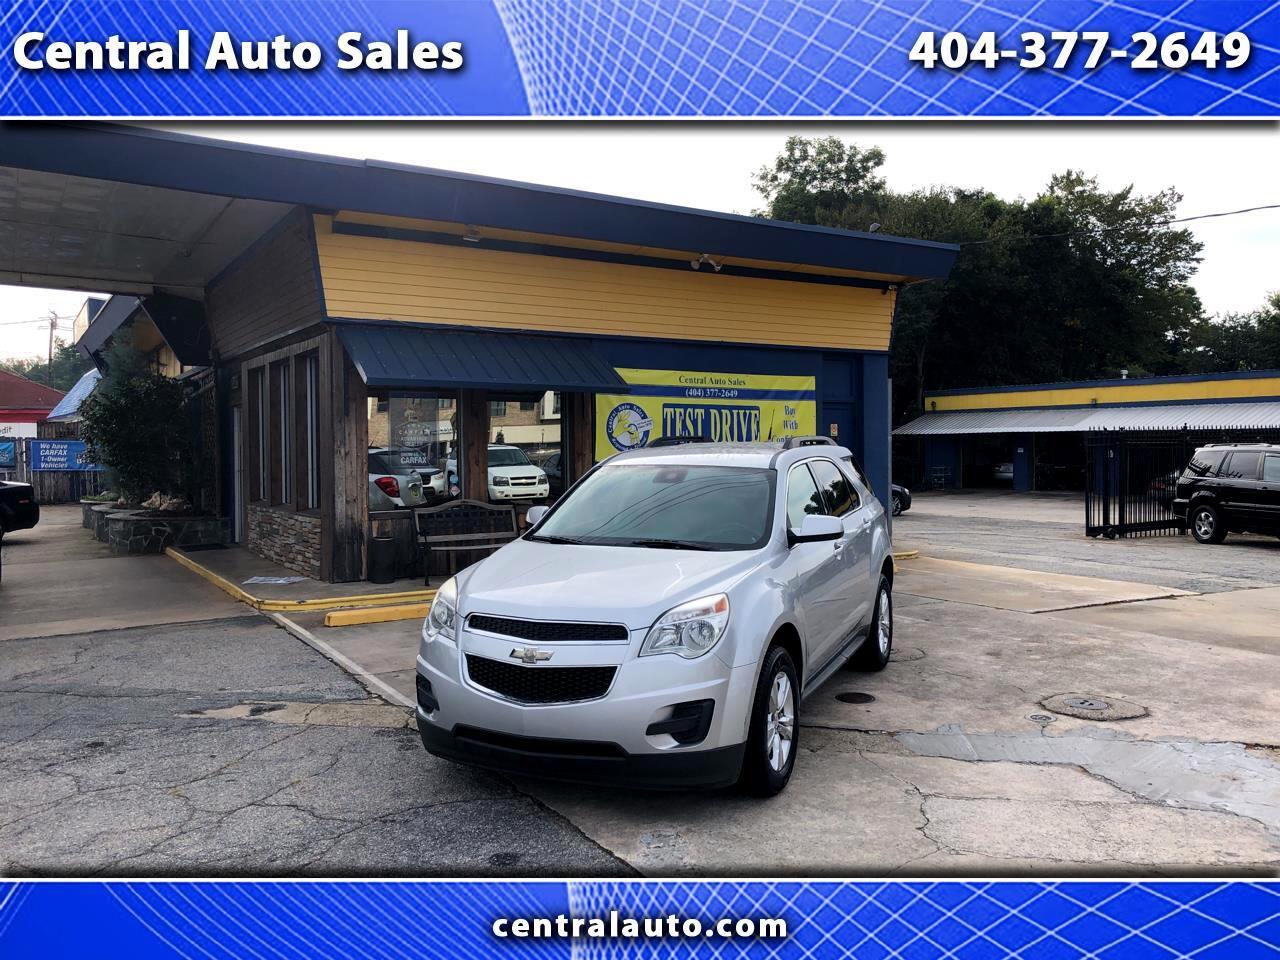 Chevrolet Equinox LT AWD Base 2013